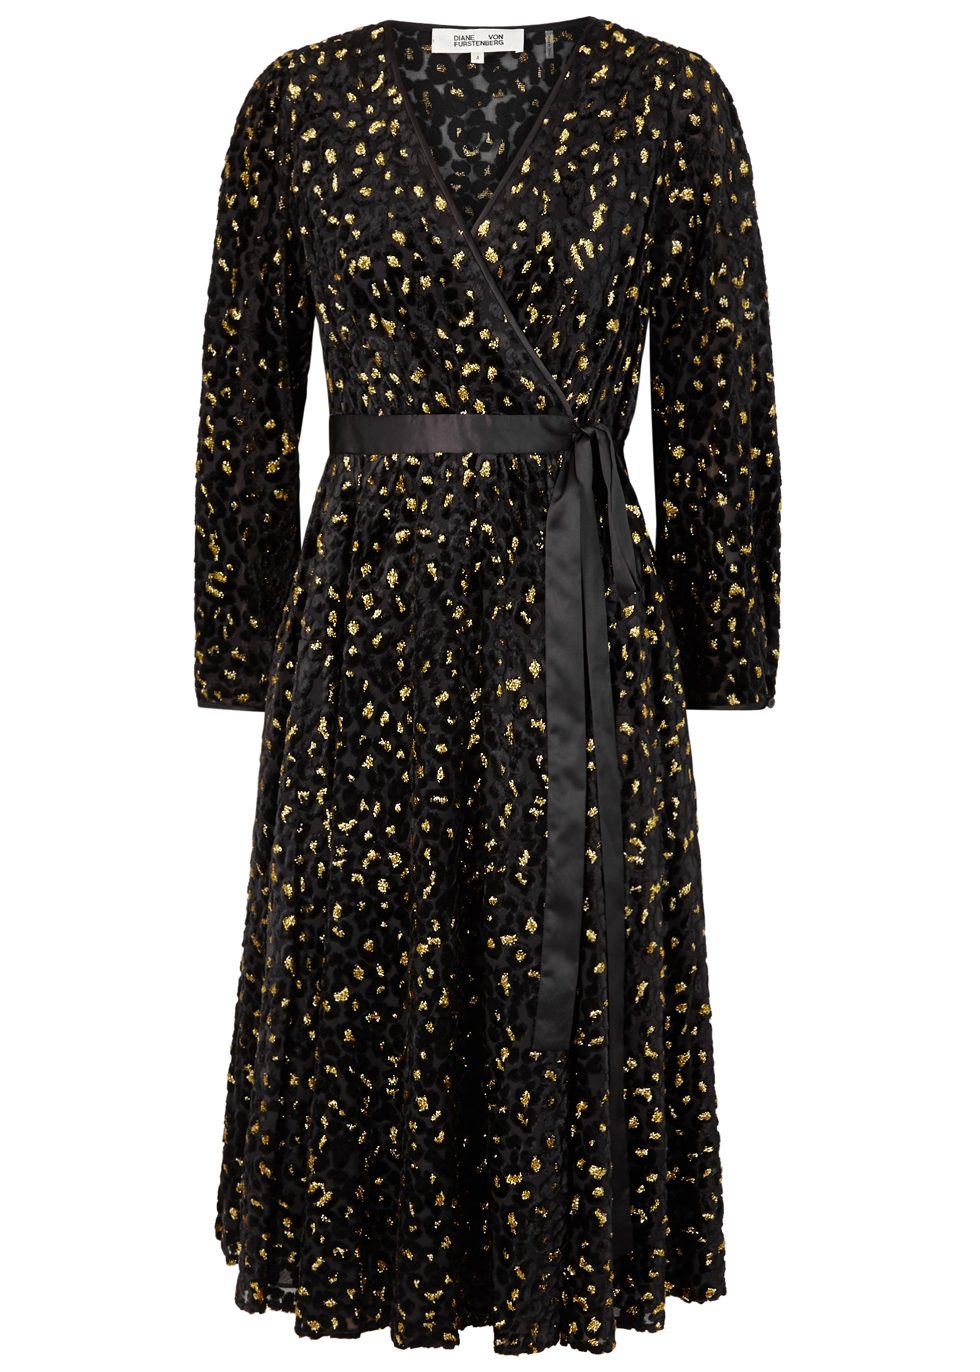 Satin-Trimmed Metallic Flocked Chiffon Wrap Dress in Black